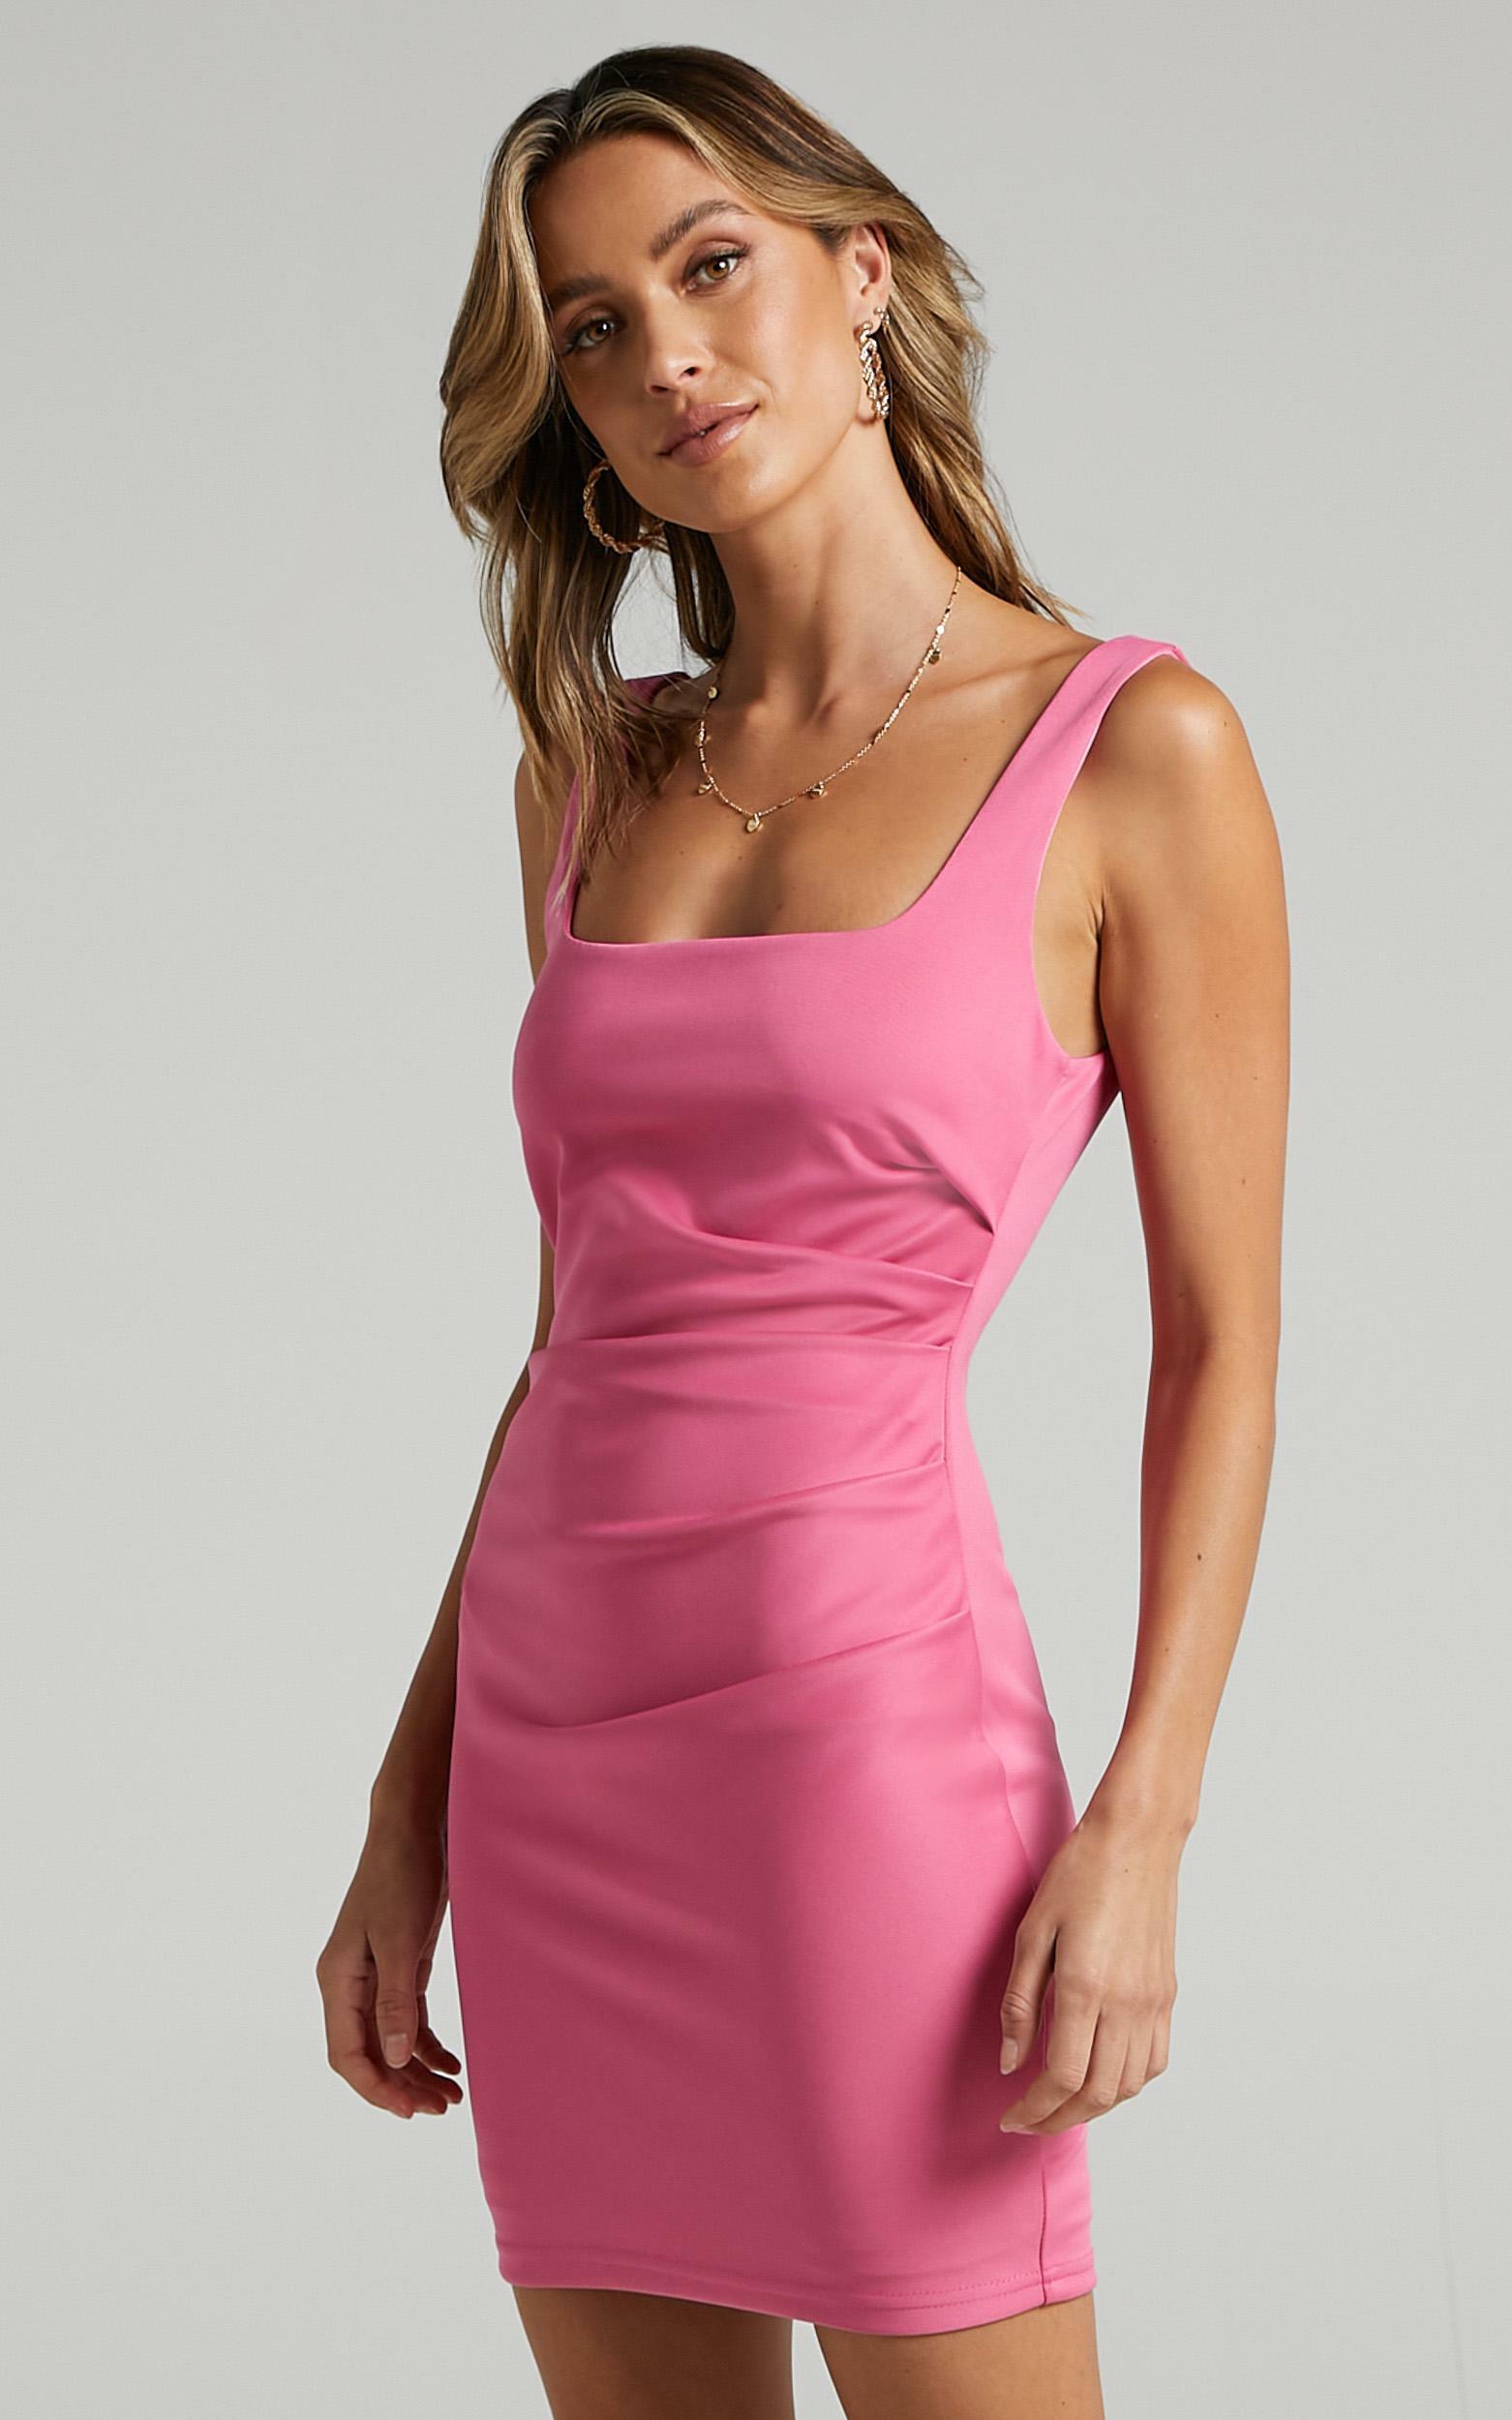 Big Love Dress in Pink - 06, PNK2, hi-res image number null